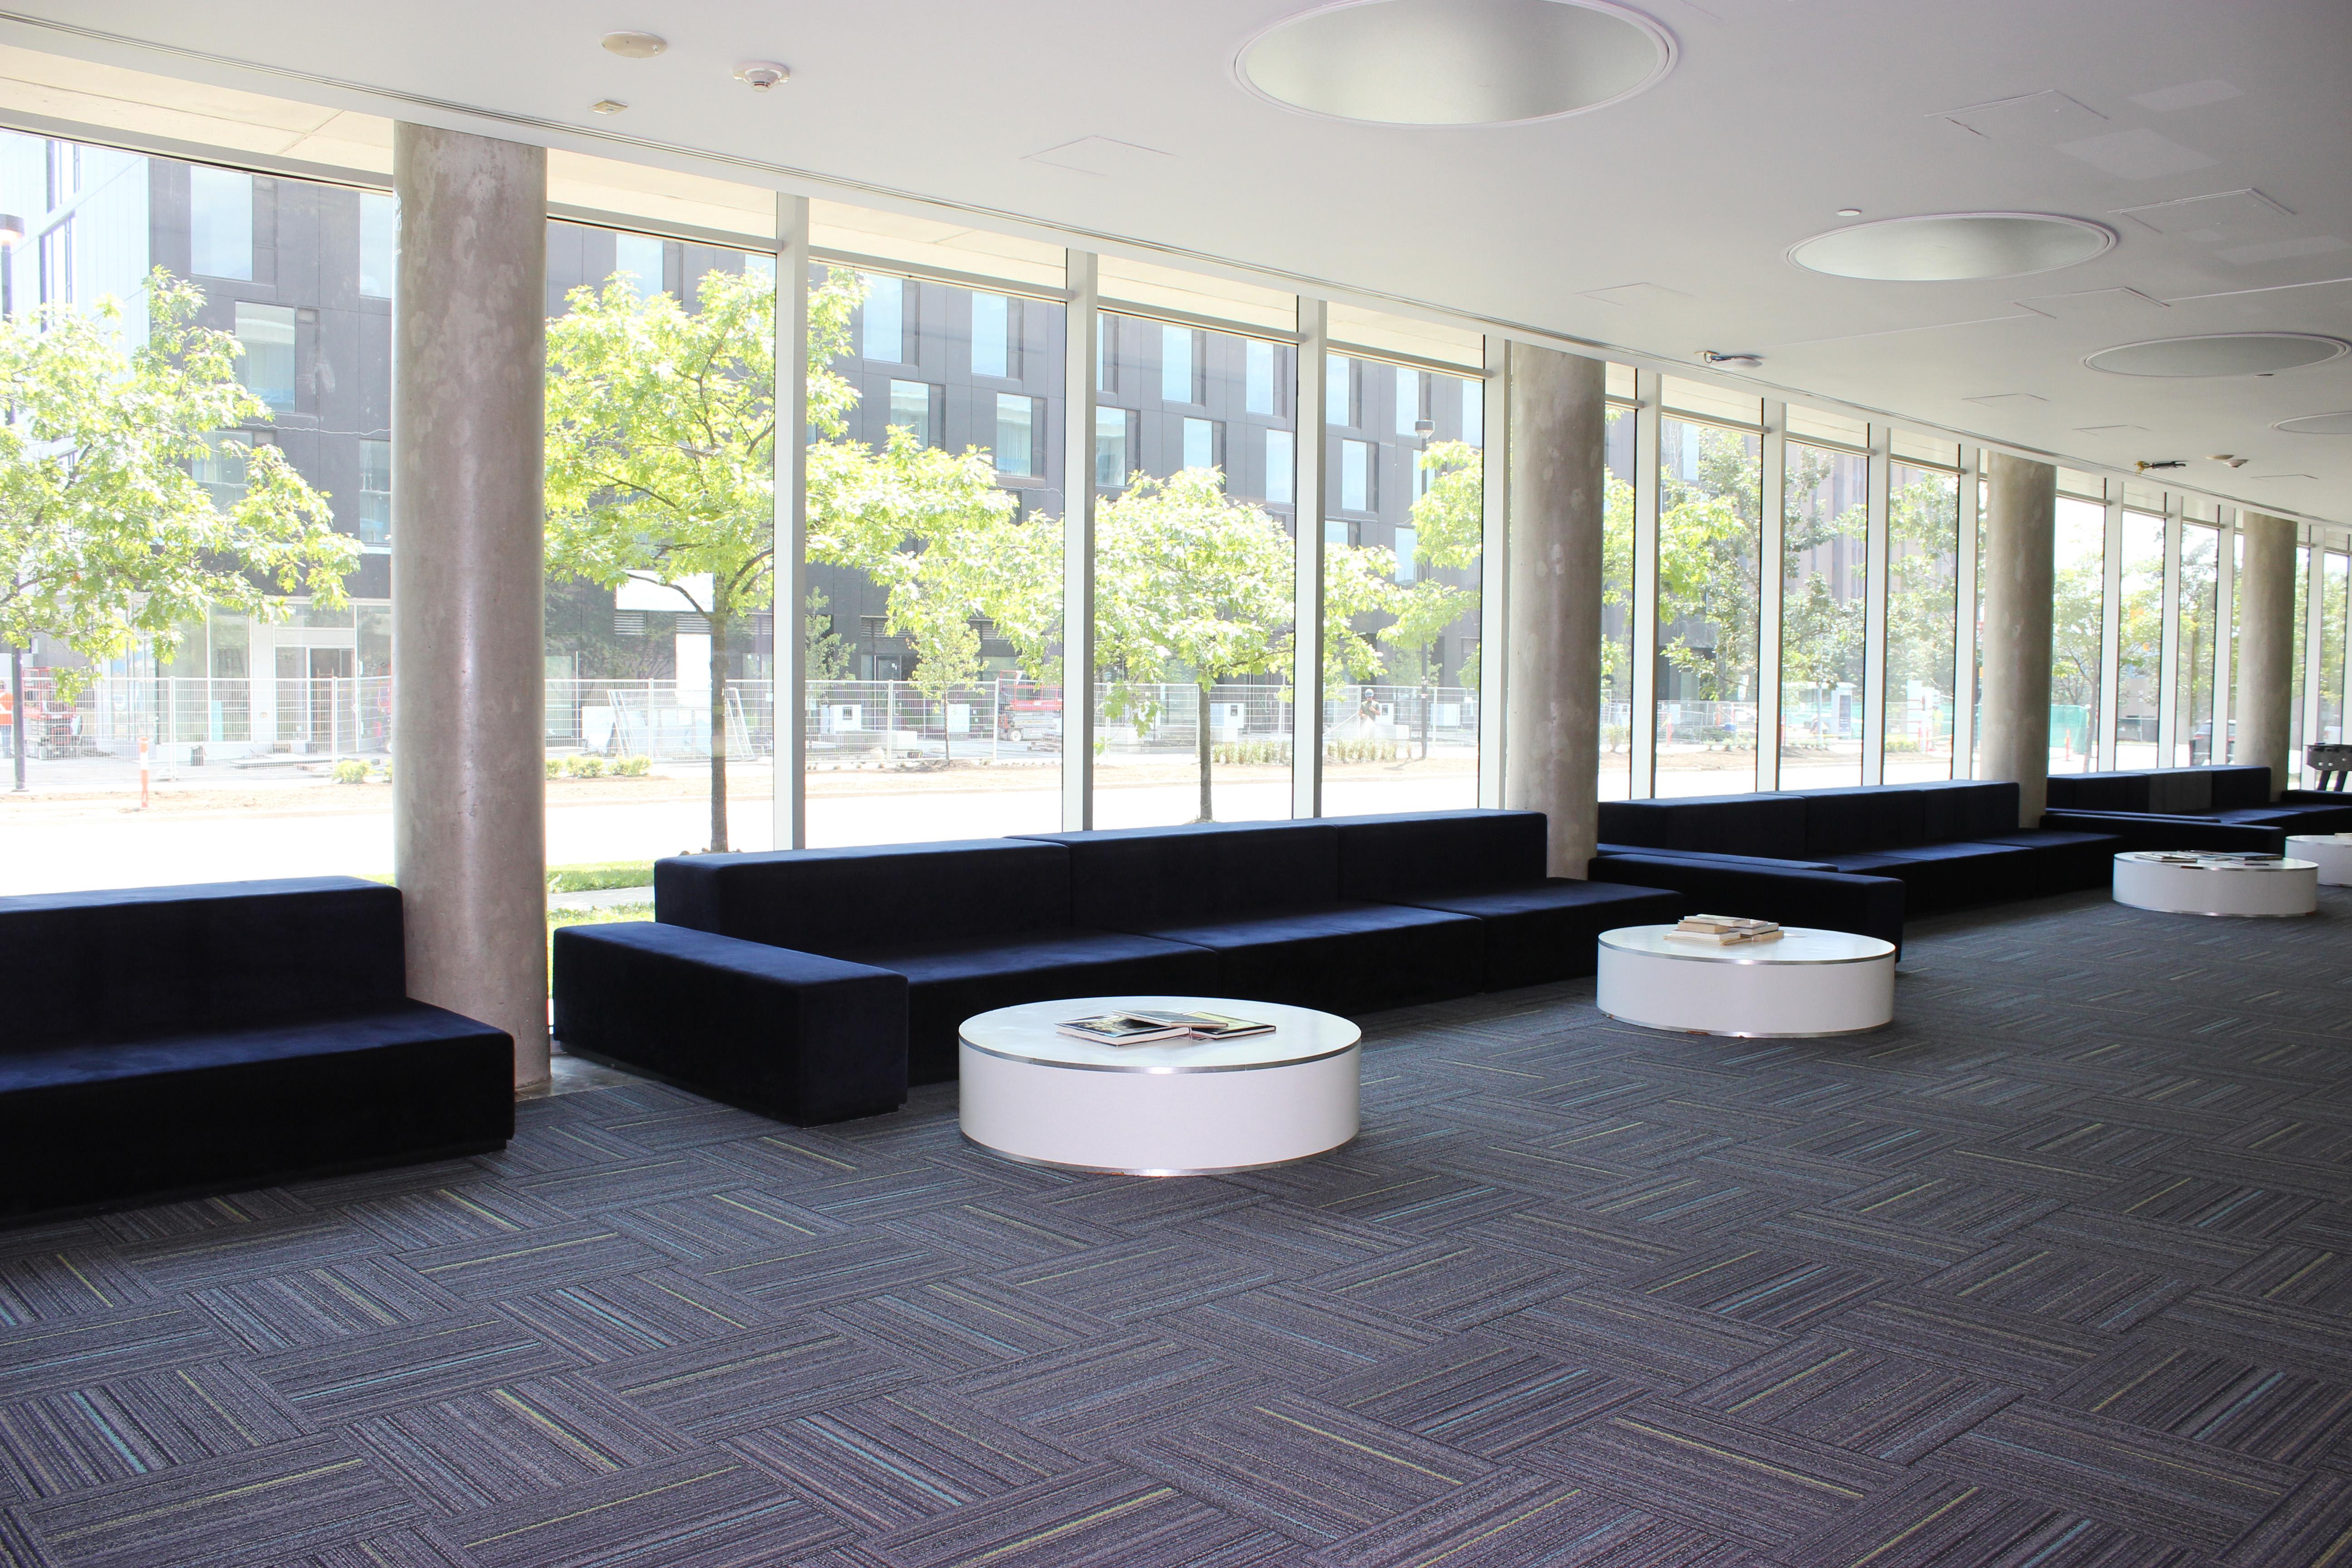 Pond interior, lobby, sofa area